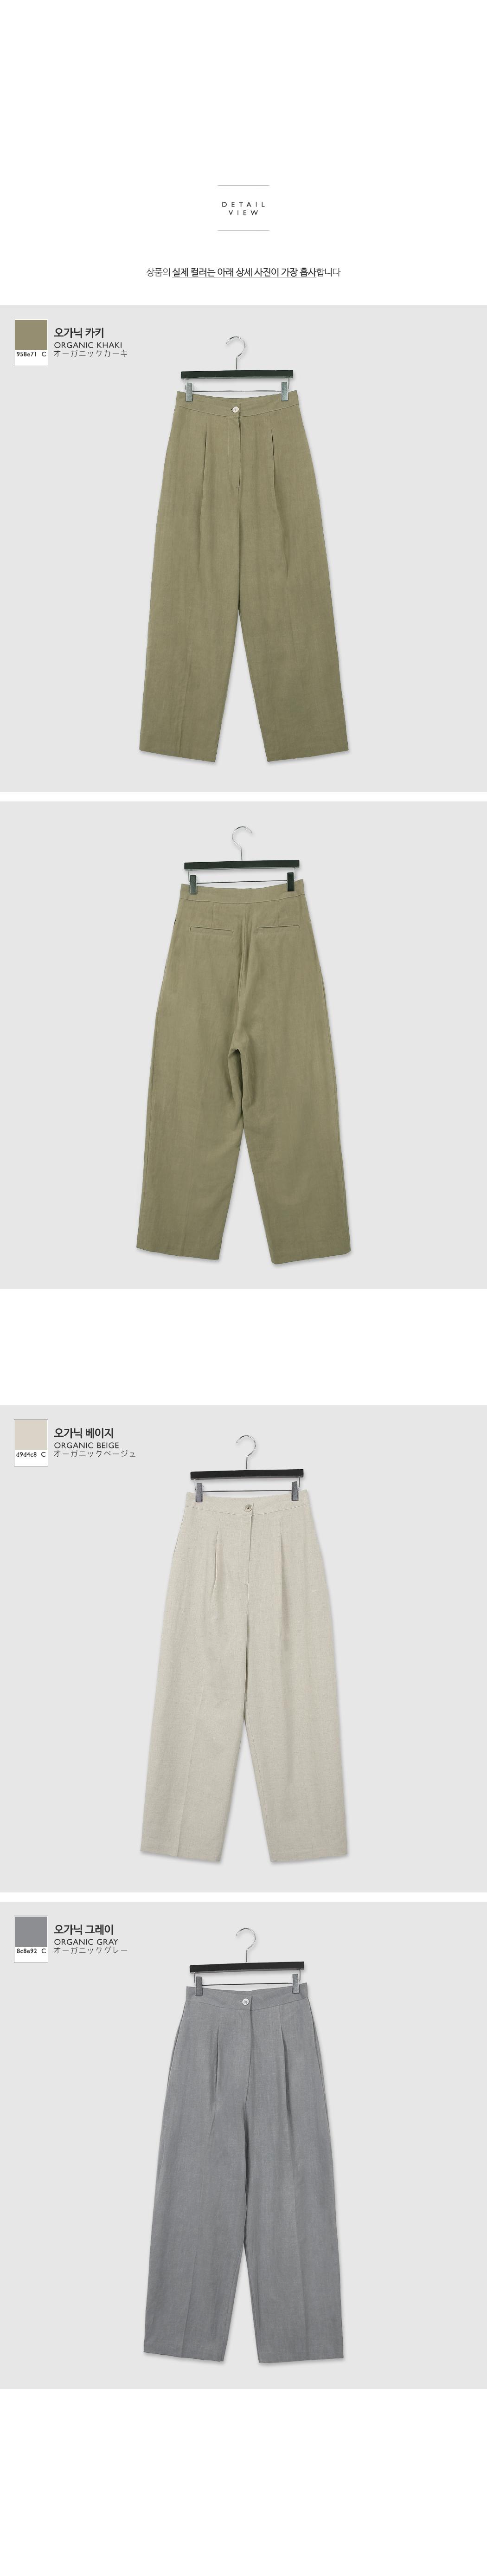 Organic wide linen slacks